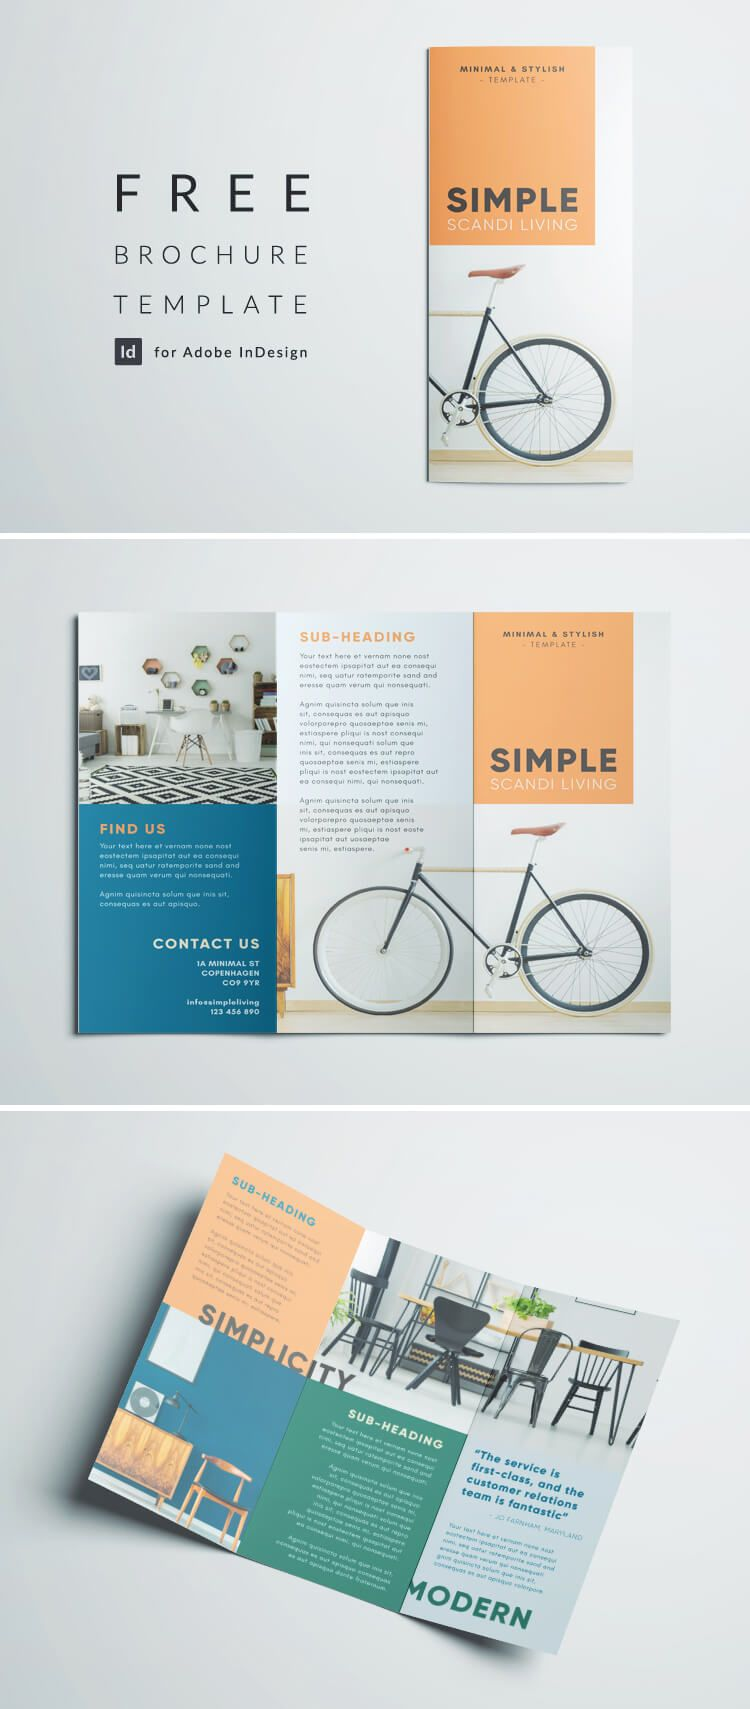 Simple Tri Fold Brochure Free Indesign Template In 3 Fold Brochure Template Free Download G Trifold Brochure Design Simple Brochures Free Brochure Template 3 fold brochure template free